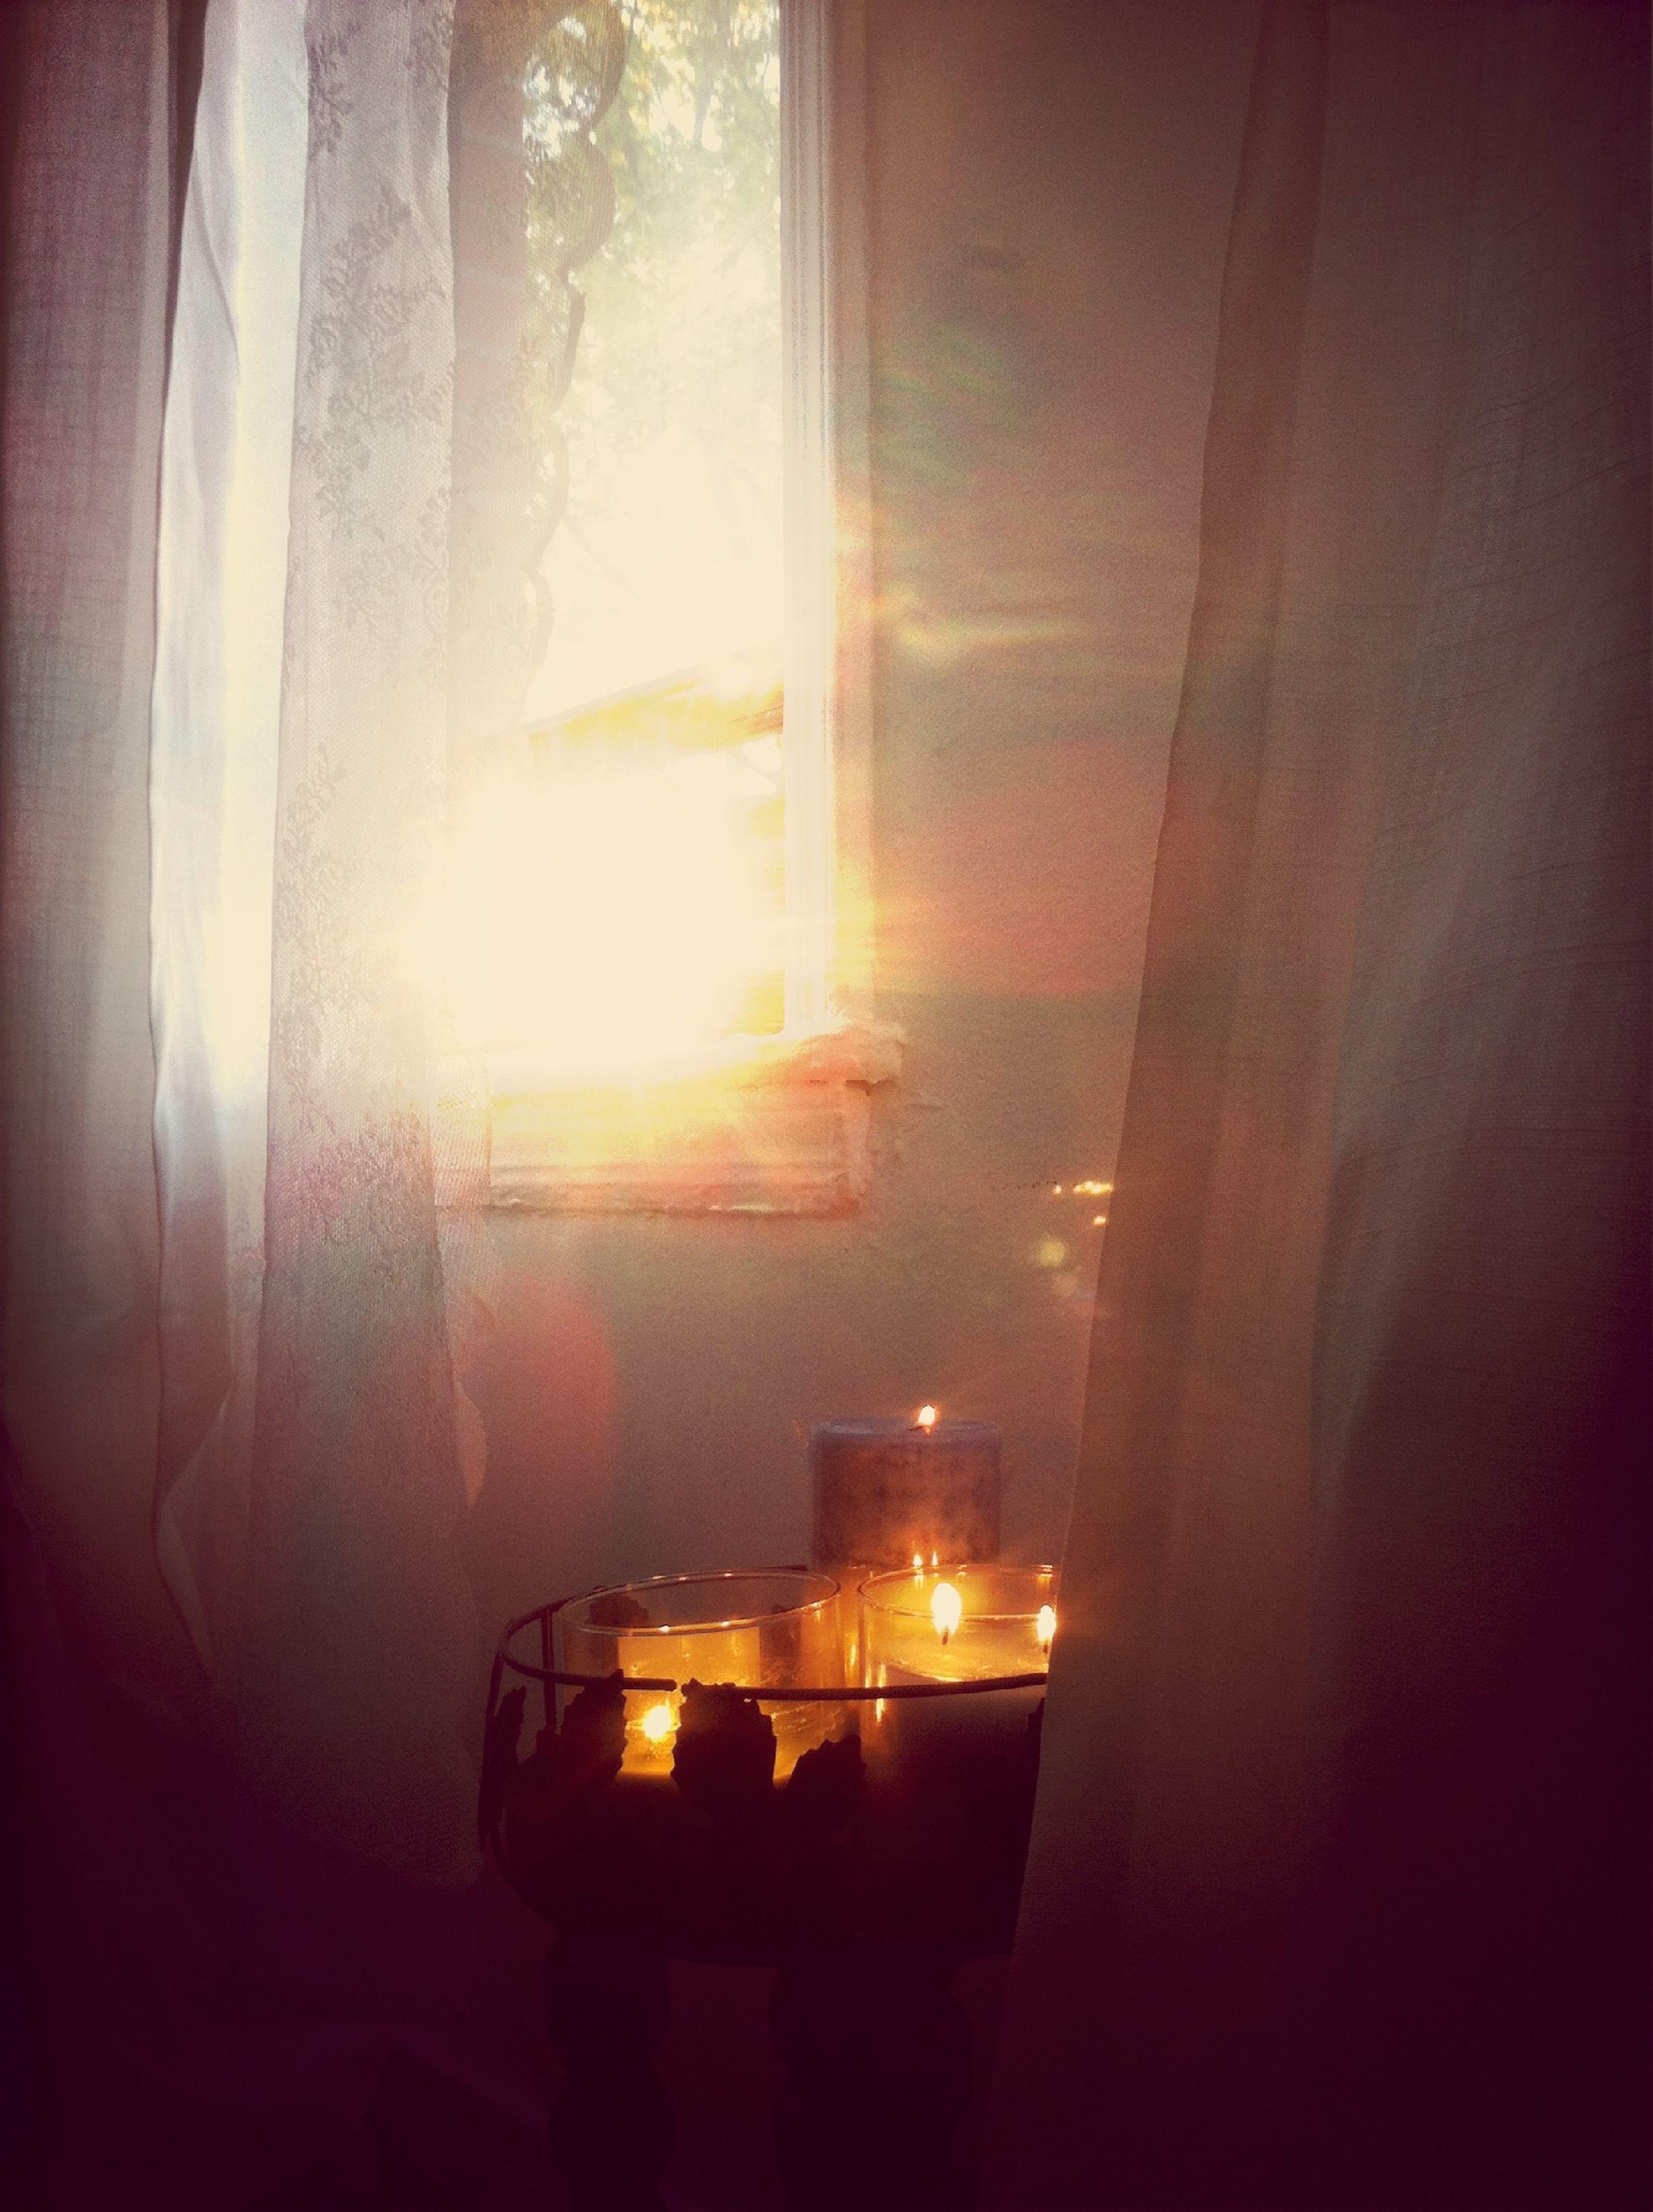 indoors, window, curtain, illuminated, glass - material, home interior, transparent, dark, lighting equipment, glowing, sunlight, light - natural phenomenon, house, sunbeam, no people, burning, reflection, flame, lit, darkroom